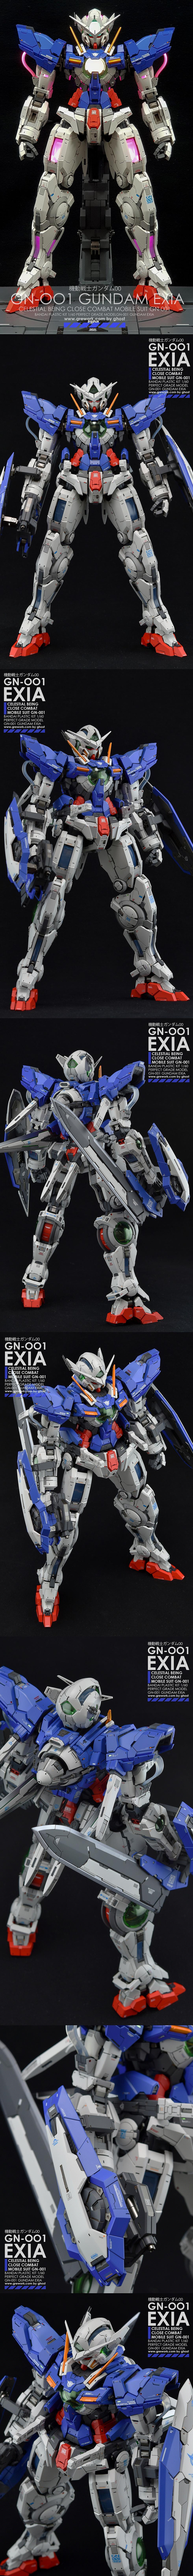 exia_05.jpg